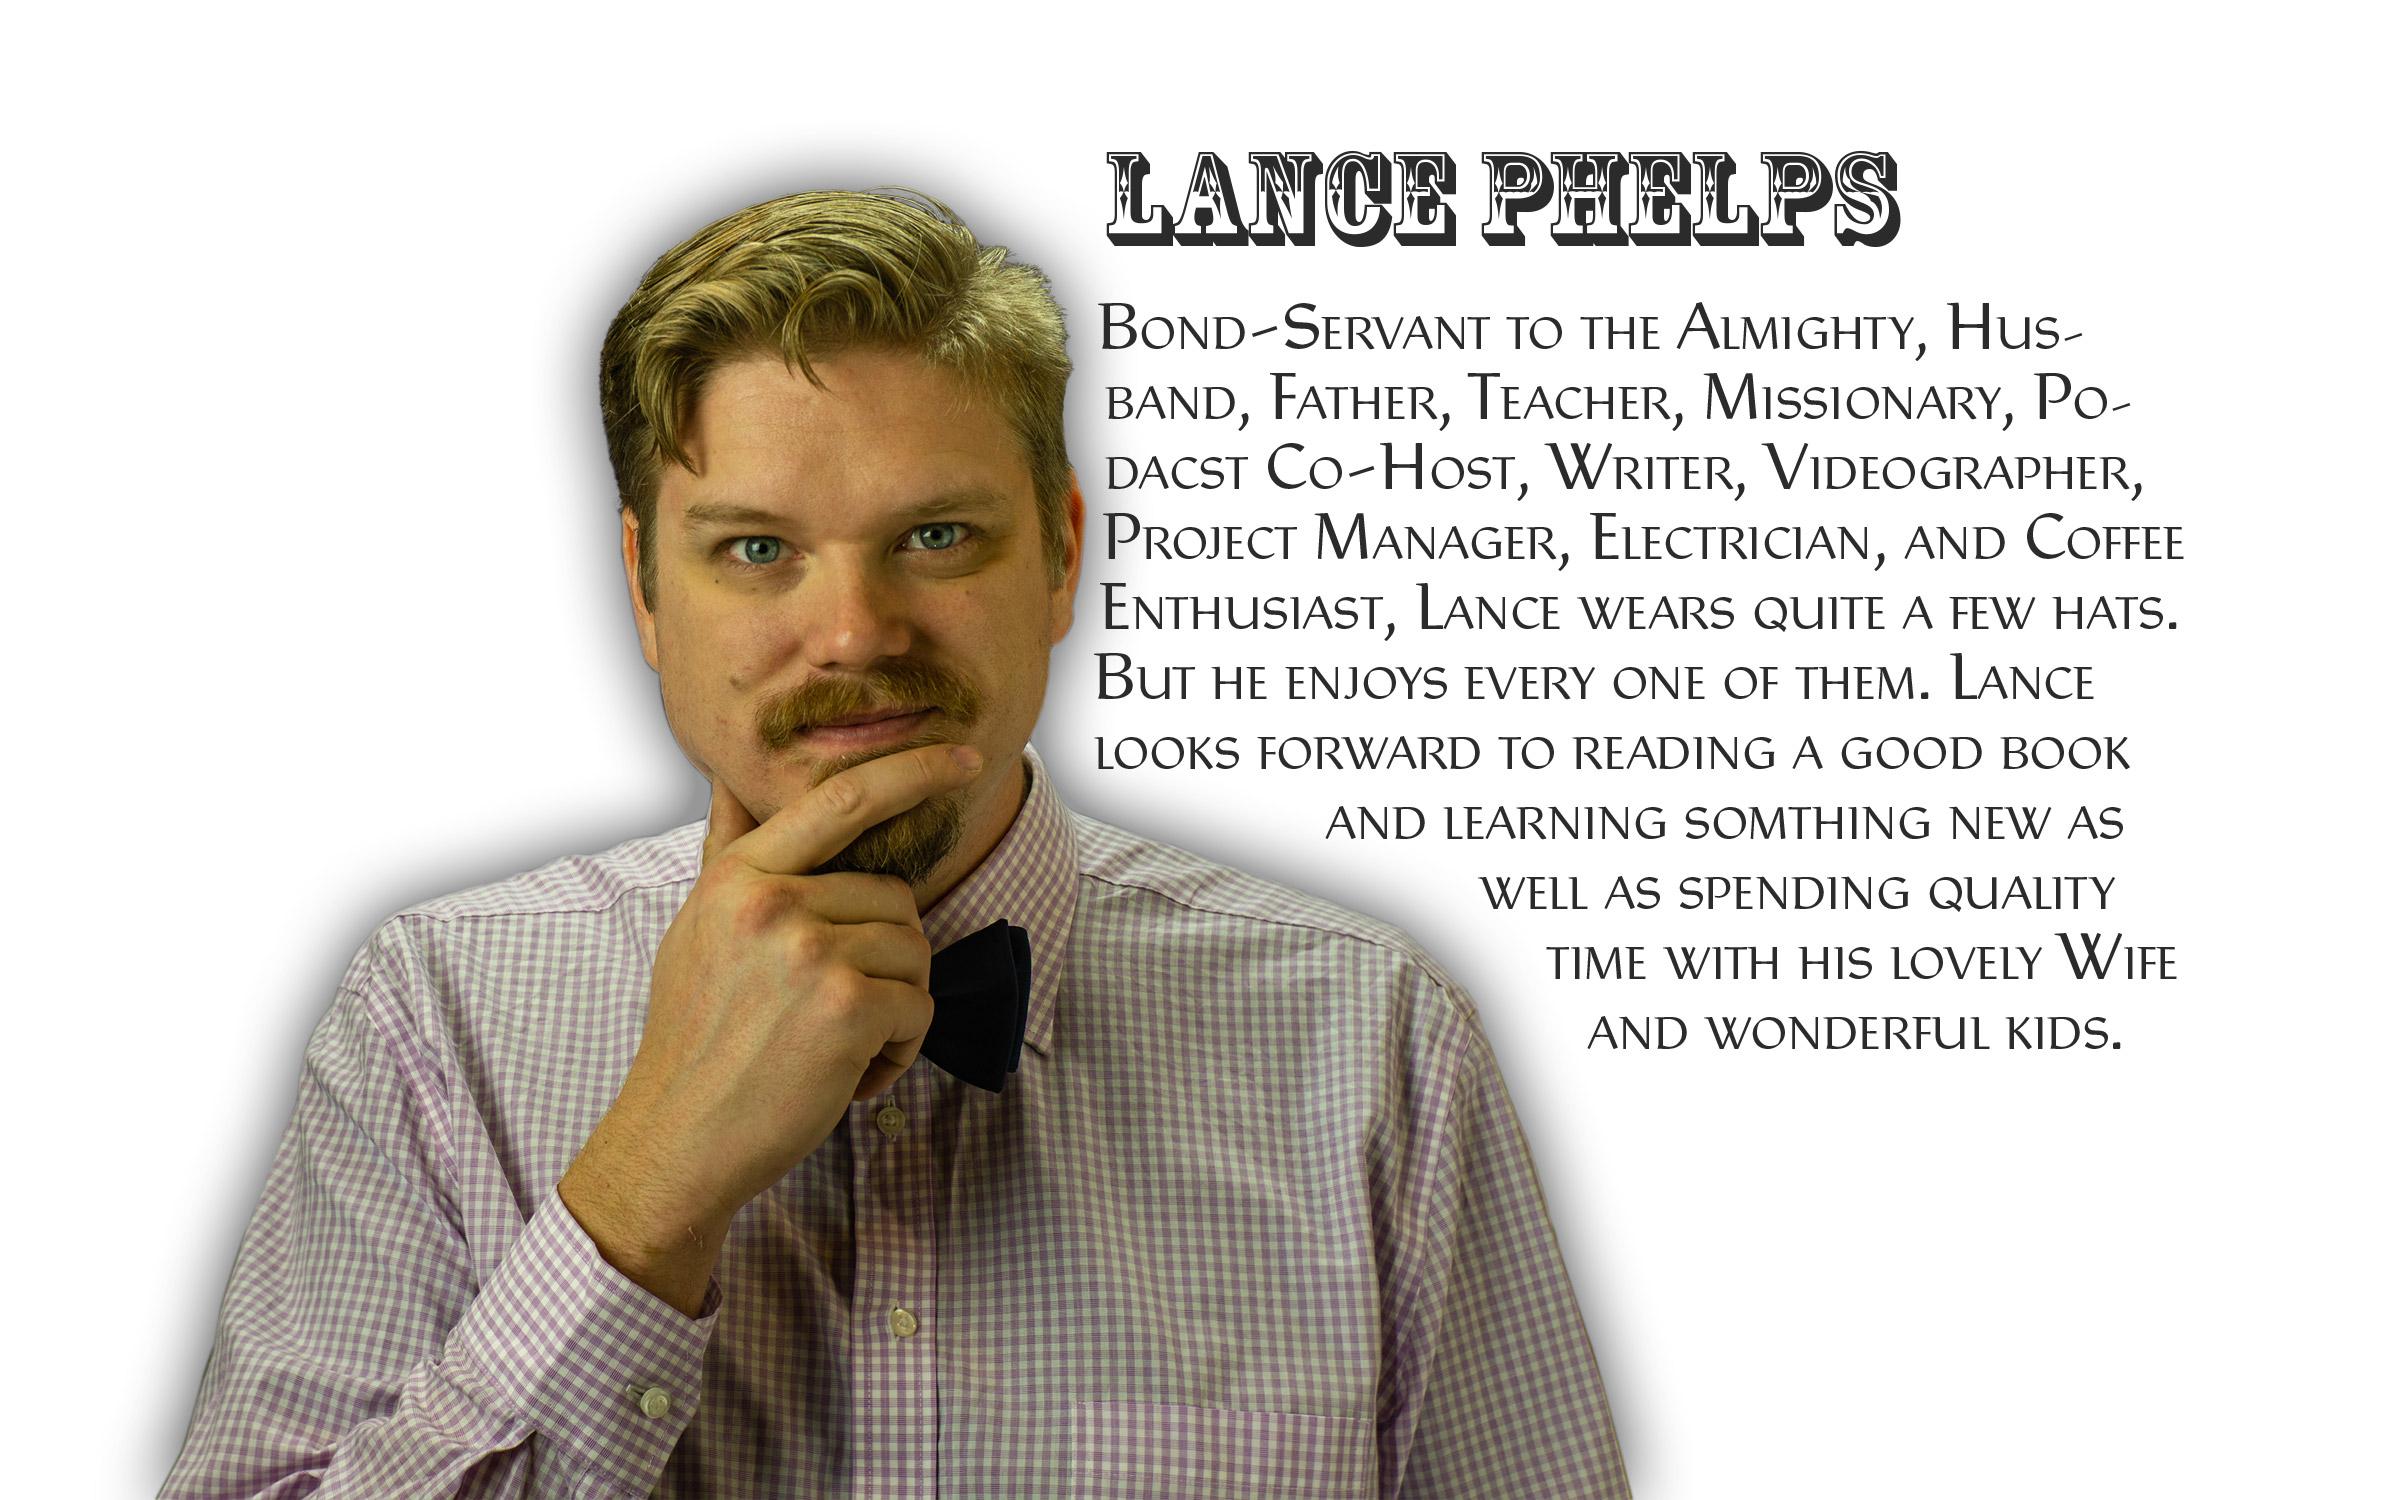 Lances About Page profile.jpg